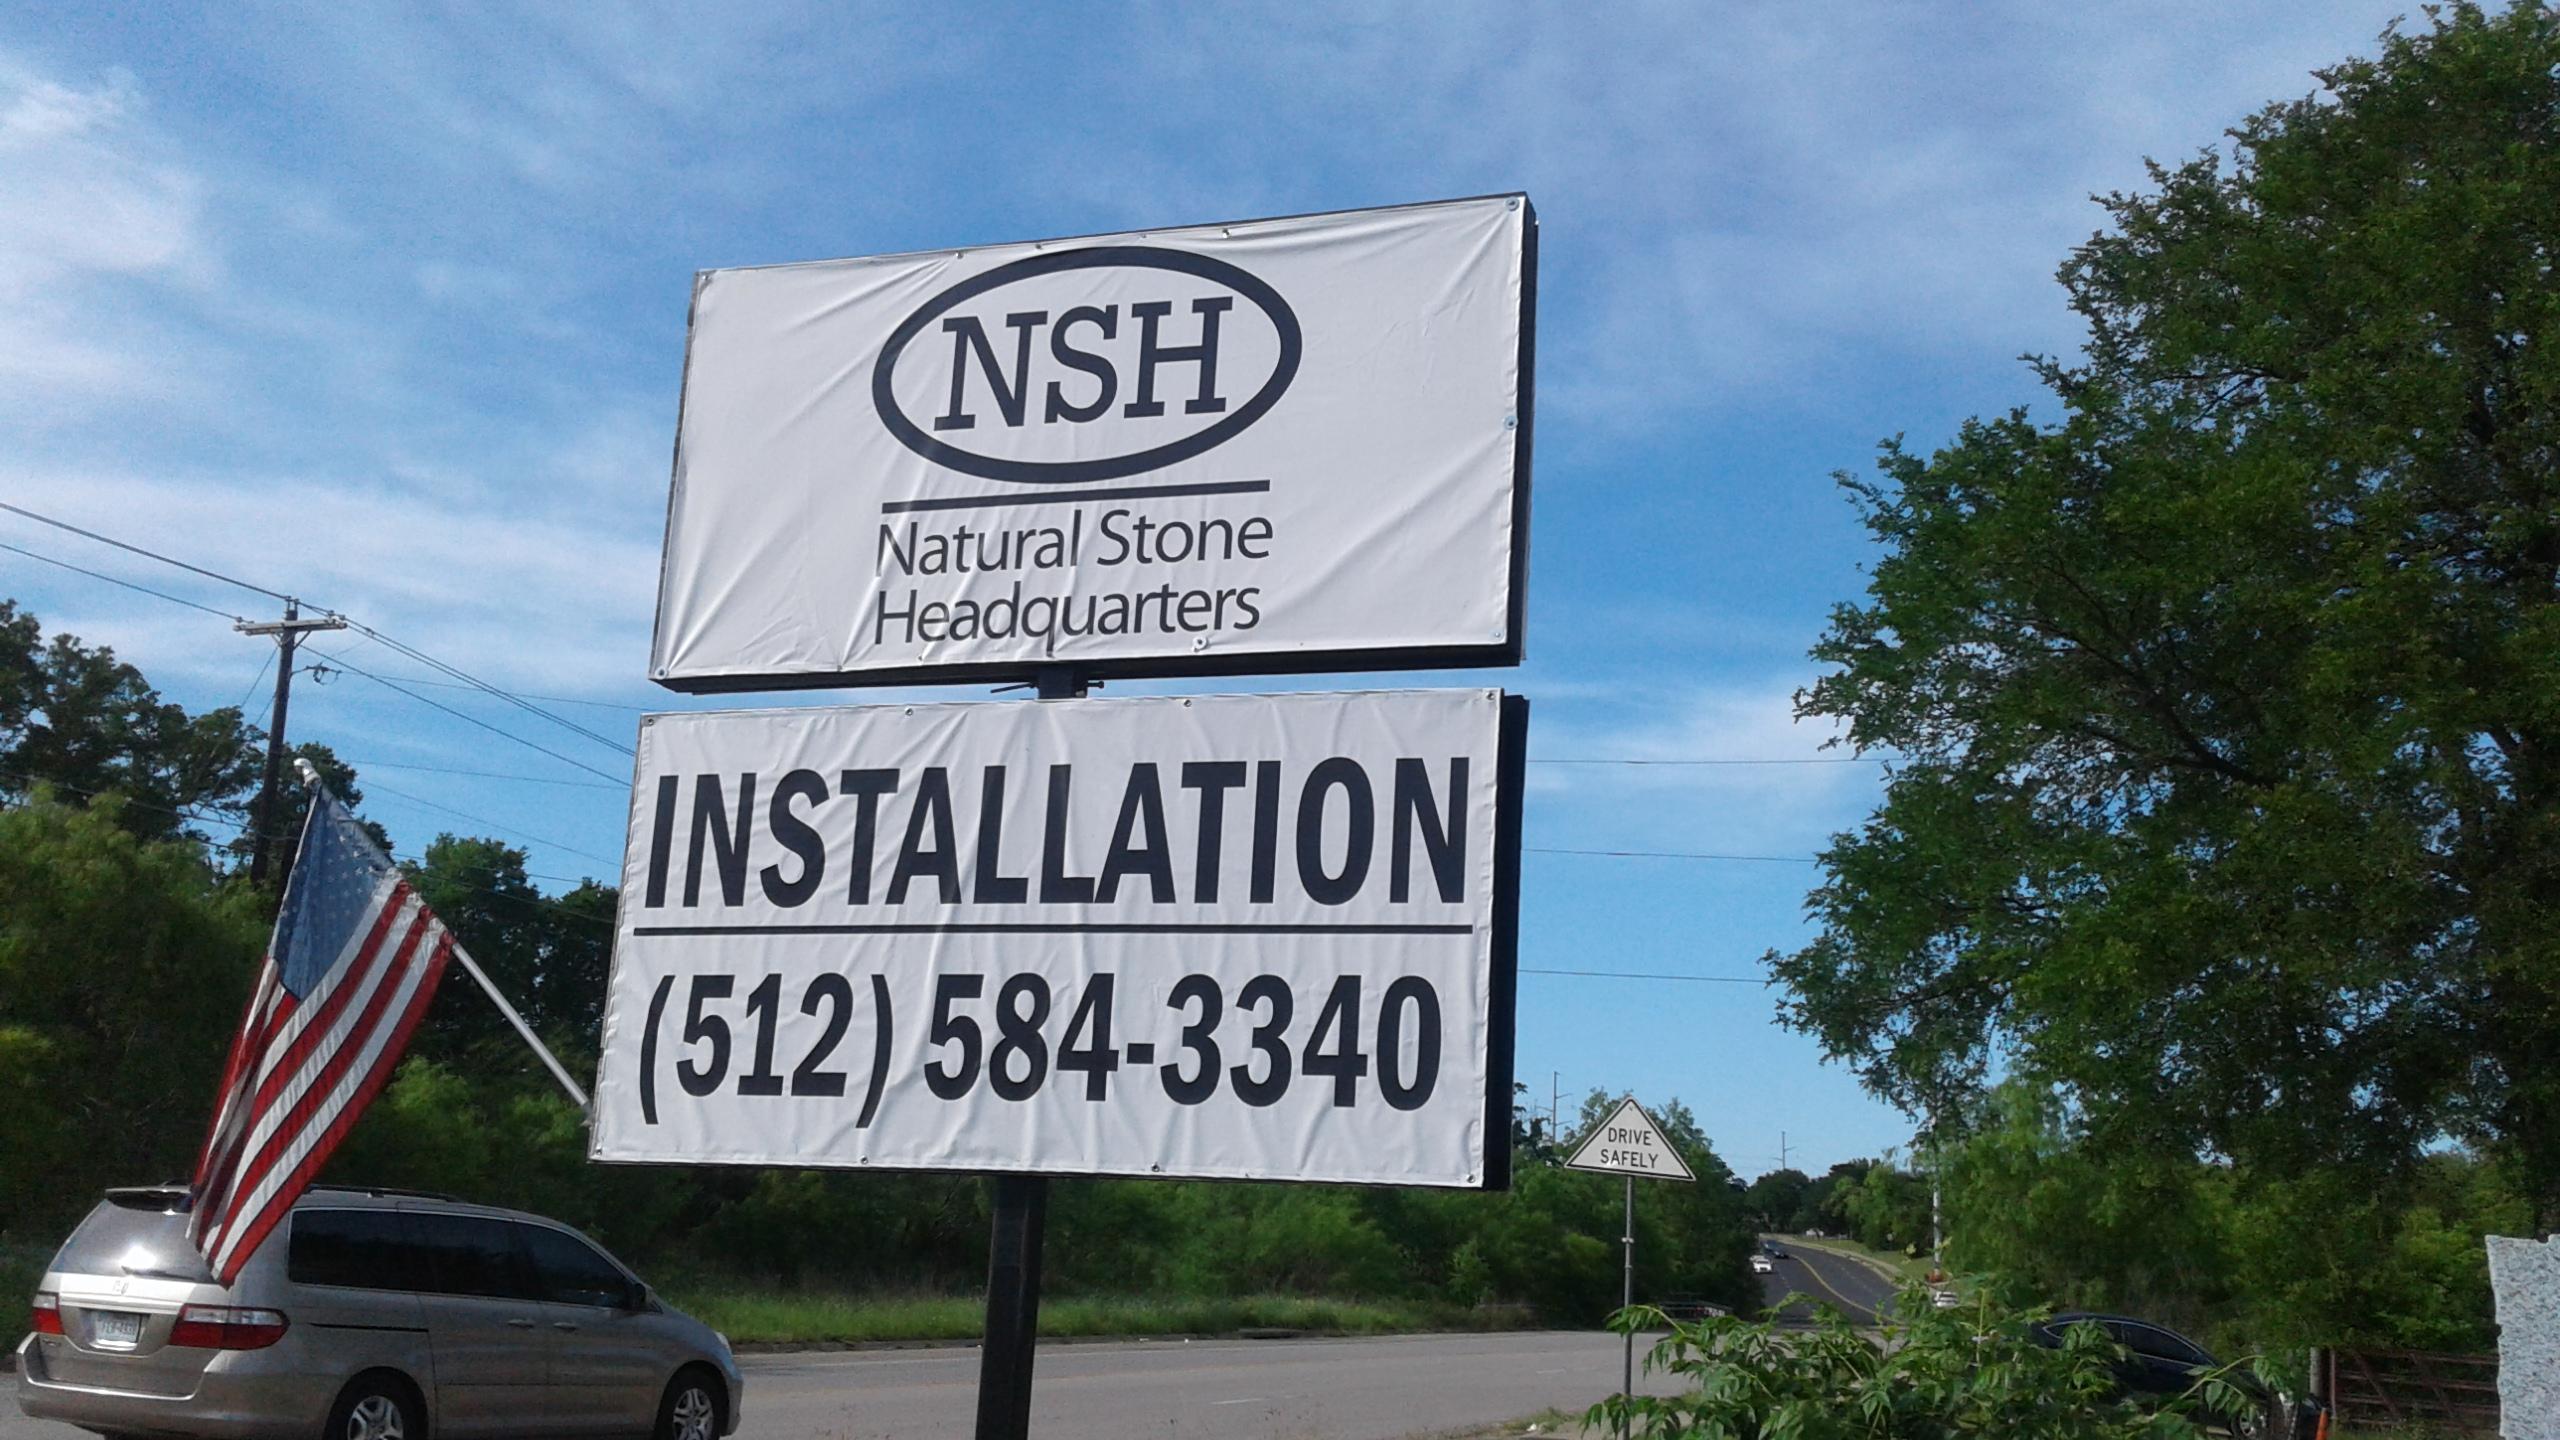 Natural Stone Headquarters